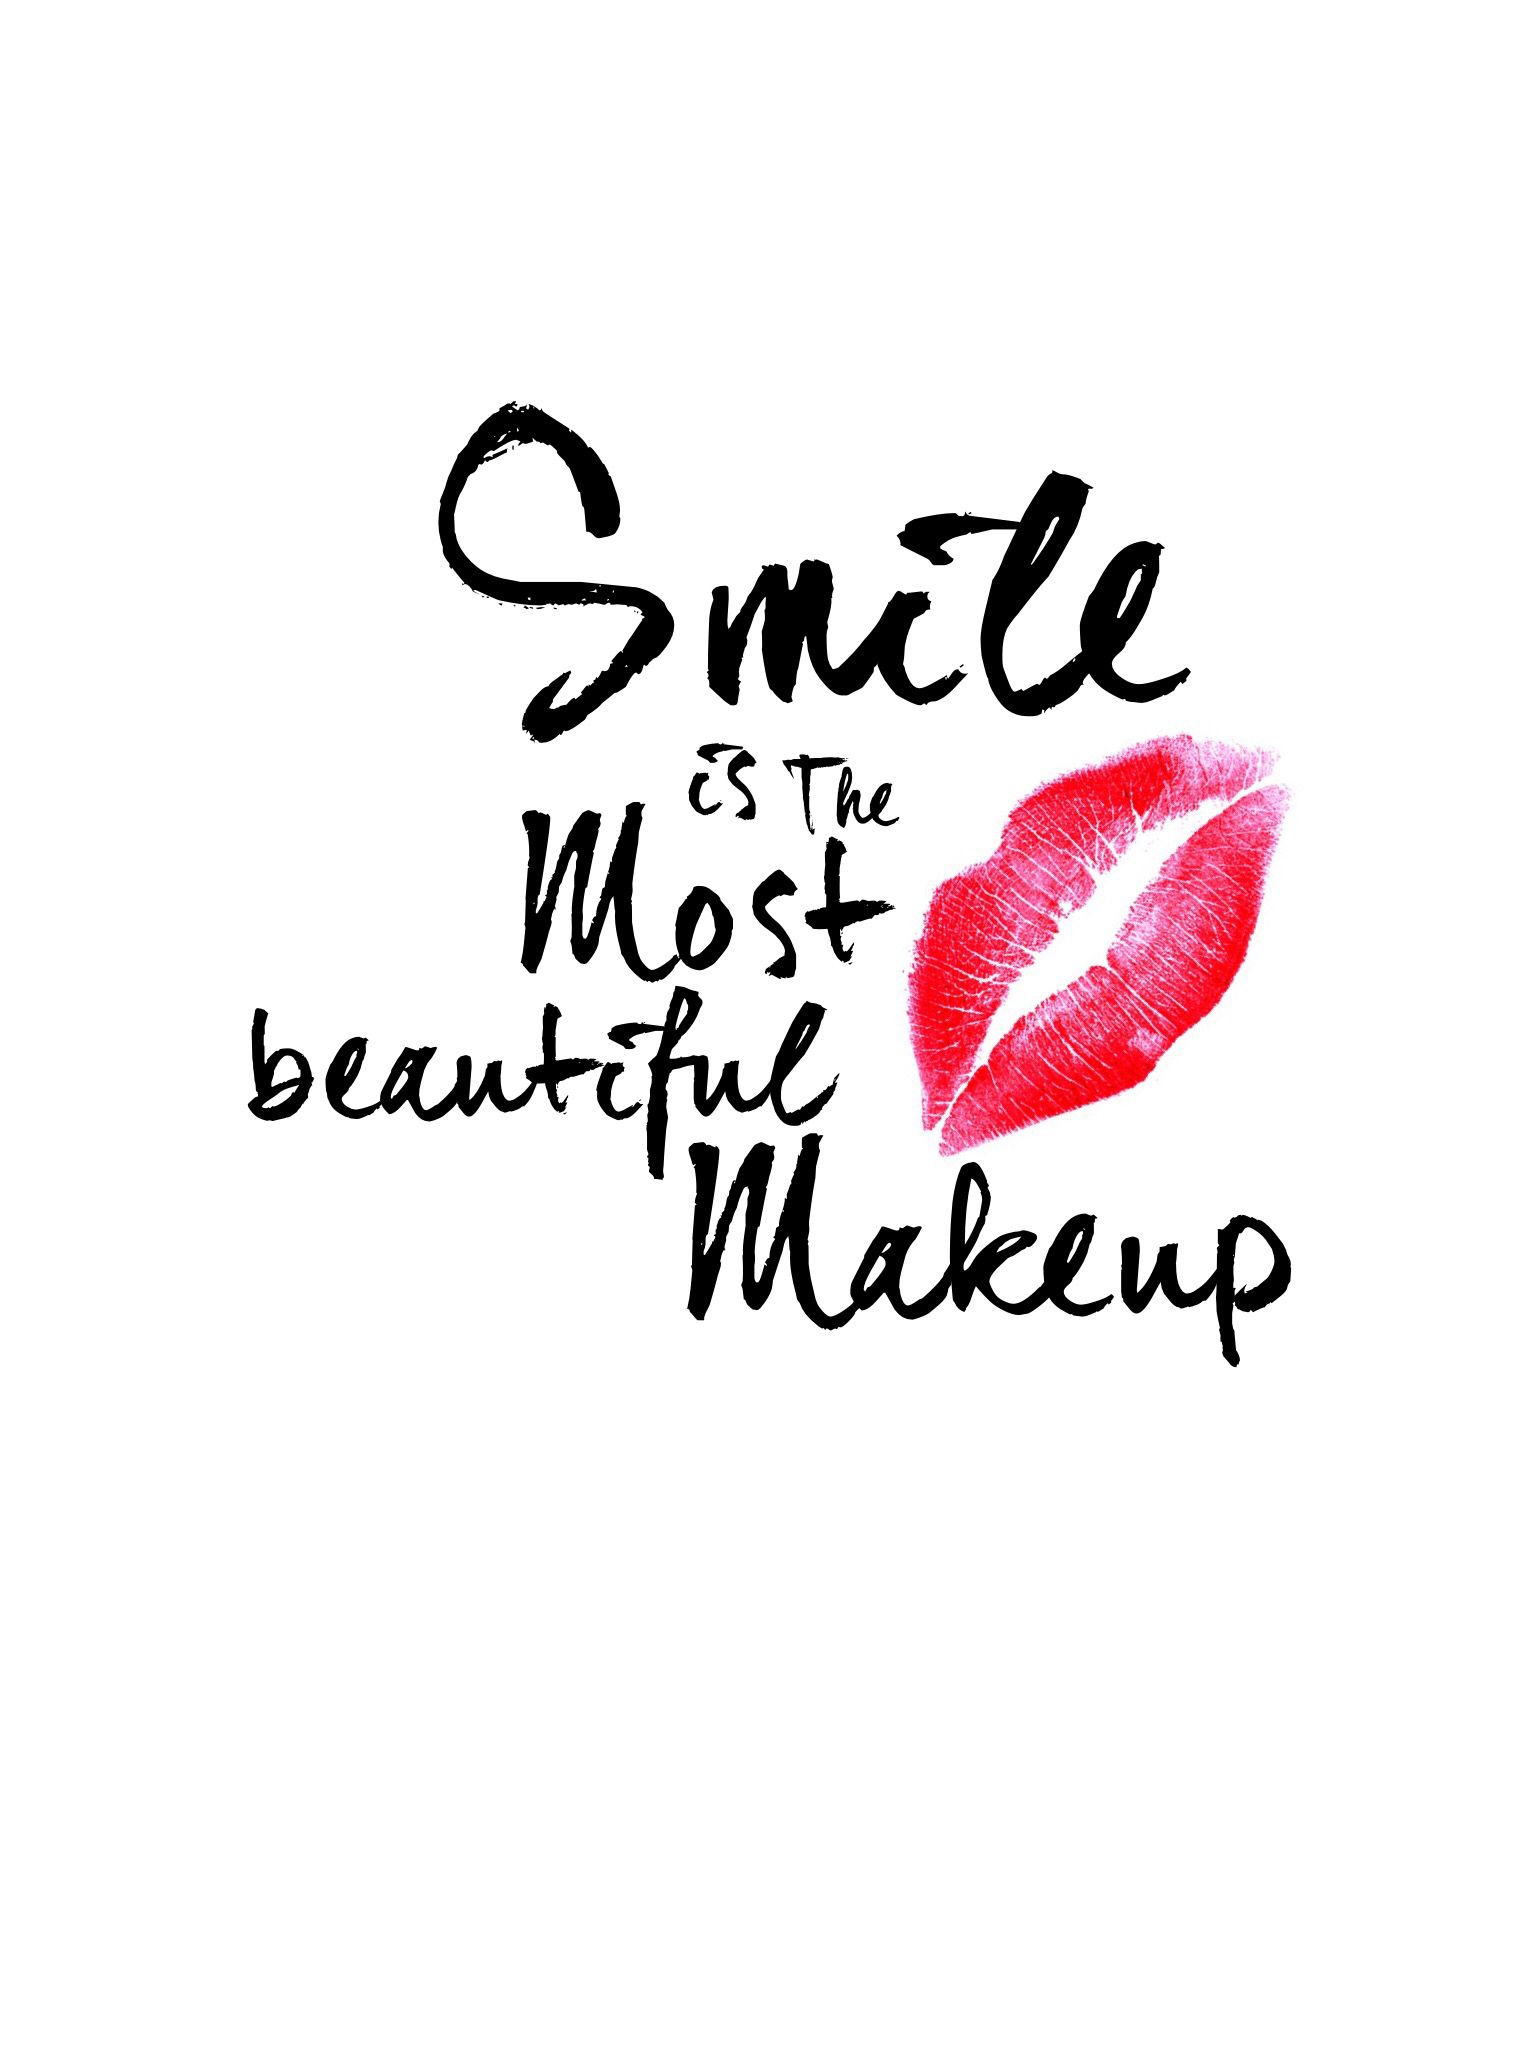 Wallpaper Wallpaper Marieghansen Lipstick Quotes Mascara Quotes Girly Quotes